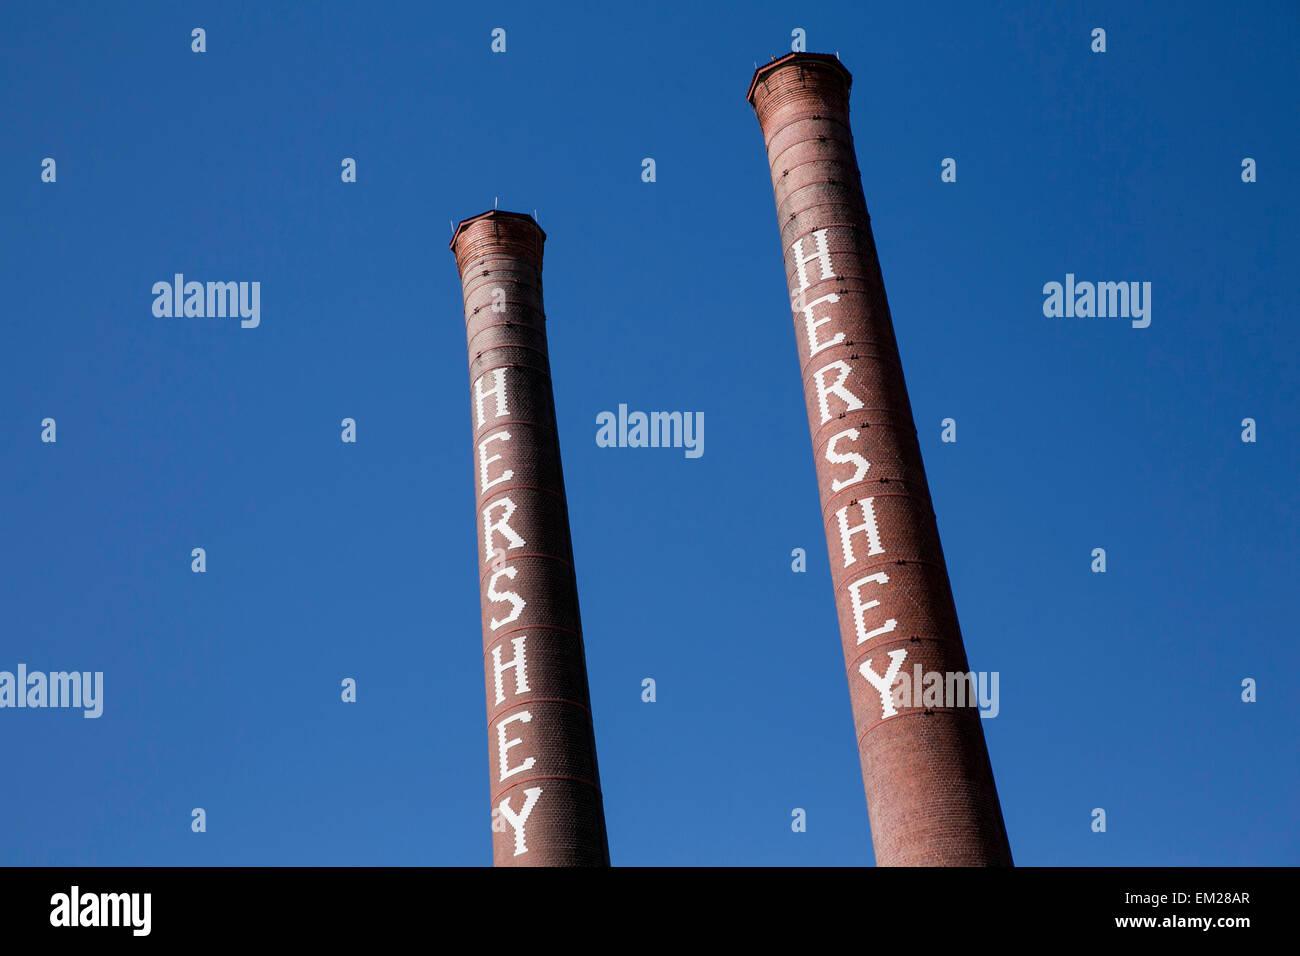 Una vista dell'originale Hershey Chocolate Factory di Hershey, Pennsylvania. Immagini Stock